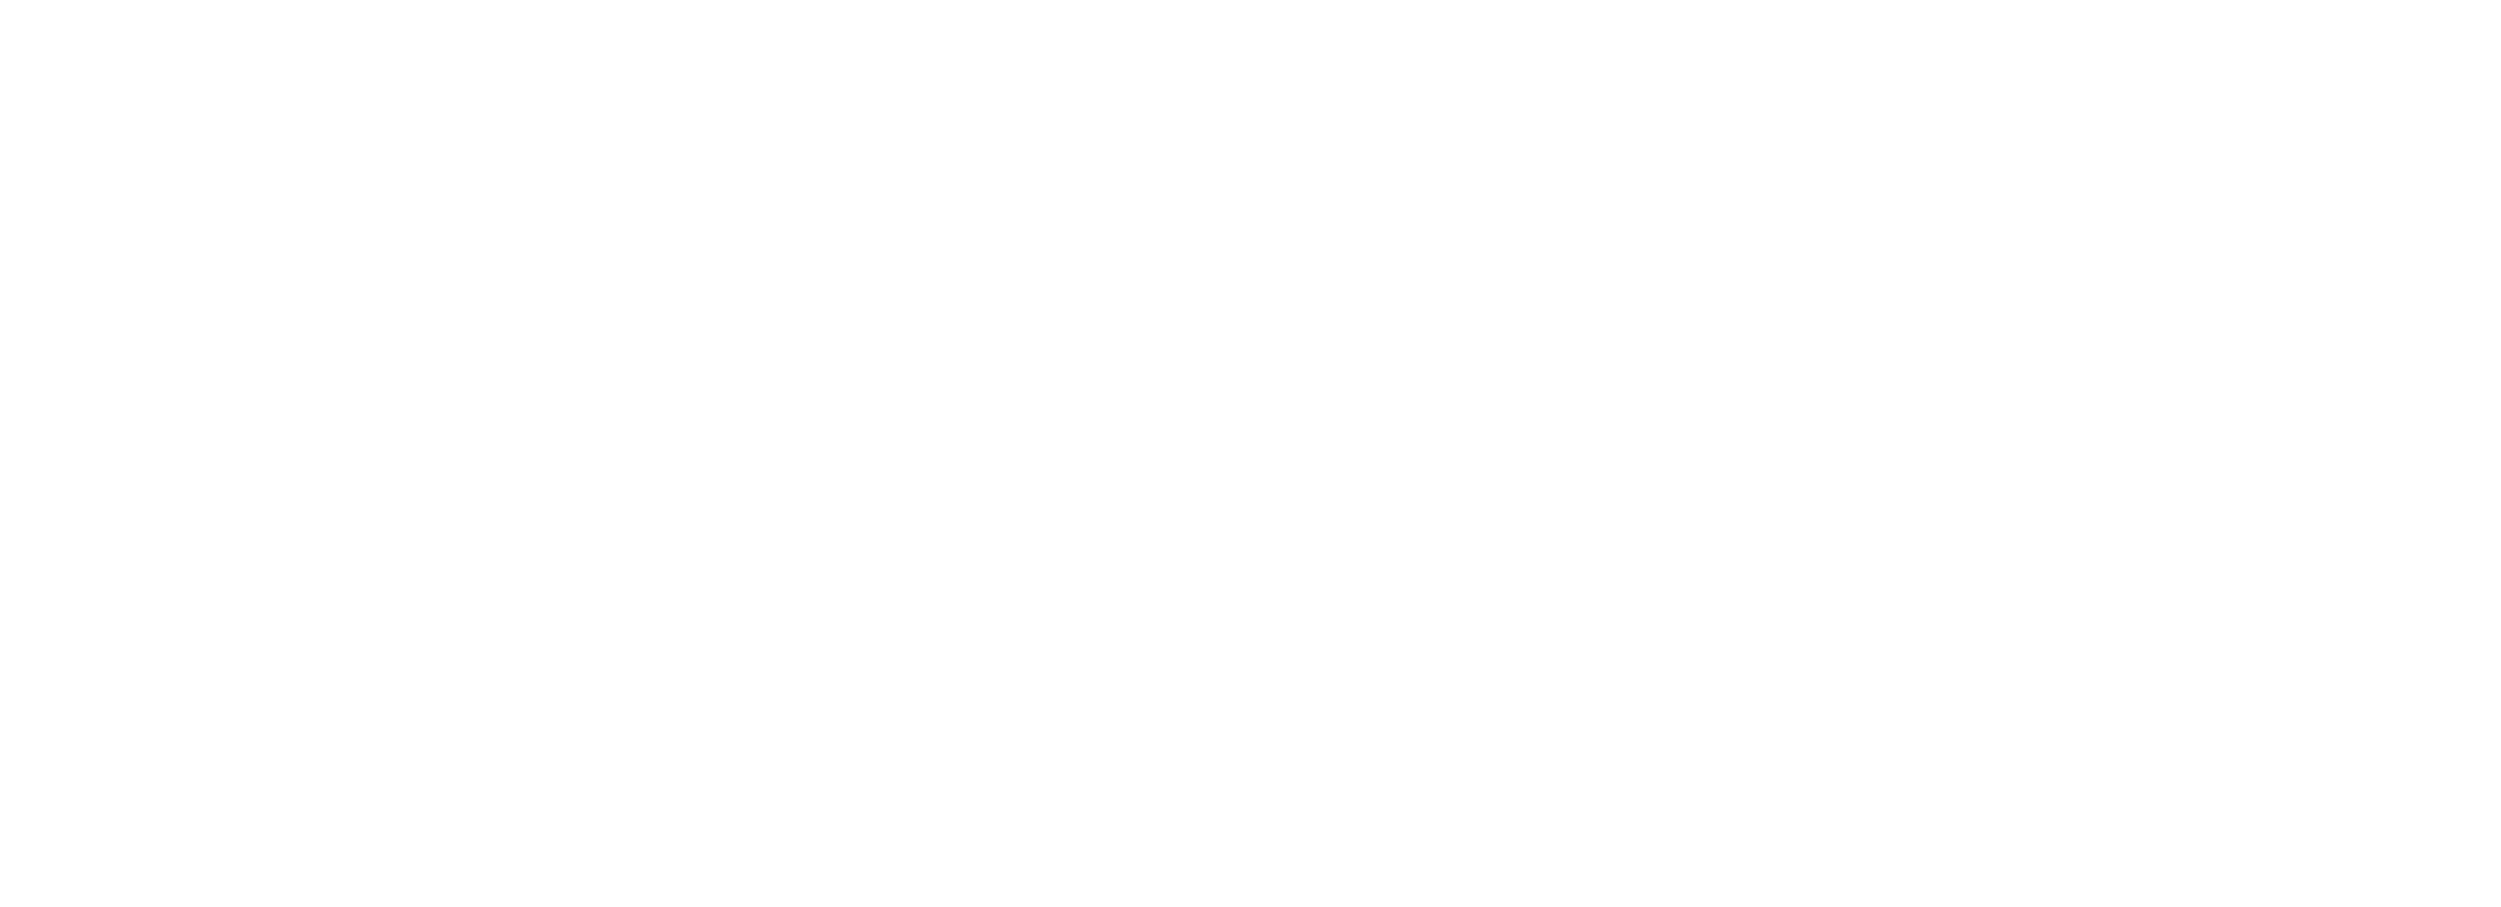 Die Psychologische Praxis Juliana Schlifelner